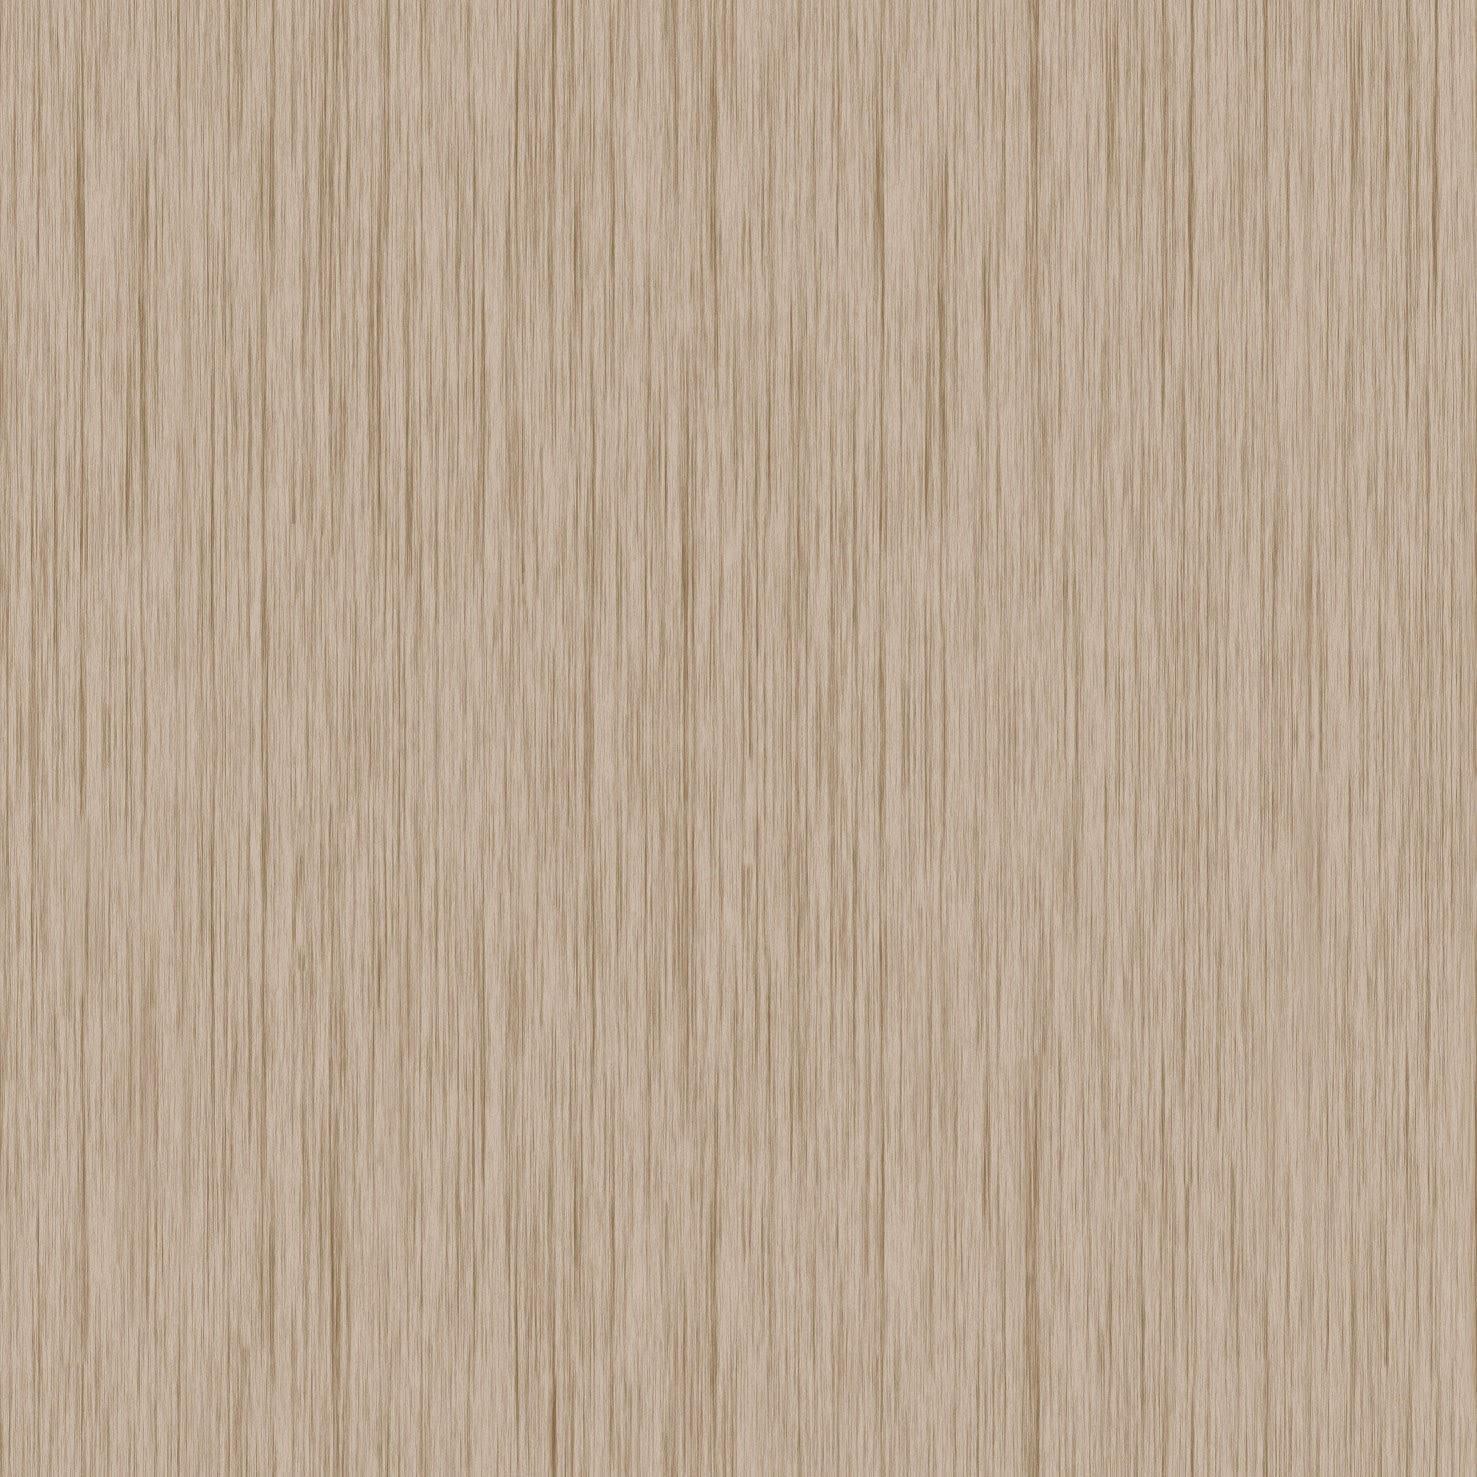 Simo texture seamless legno vari colori for Legno chiaro texture